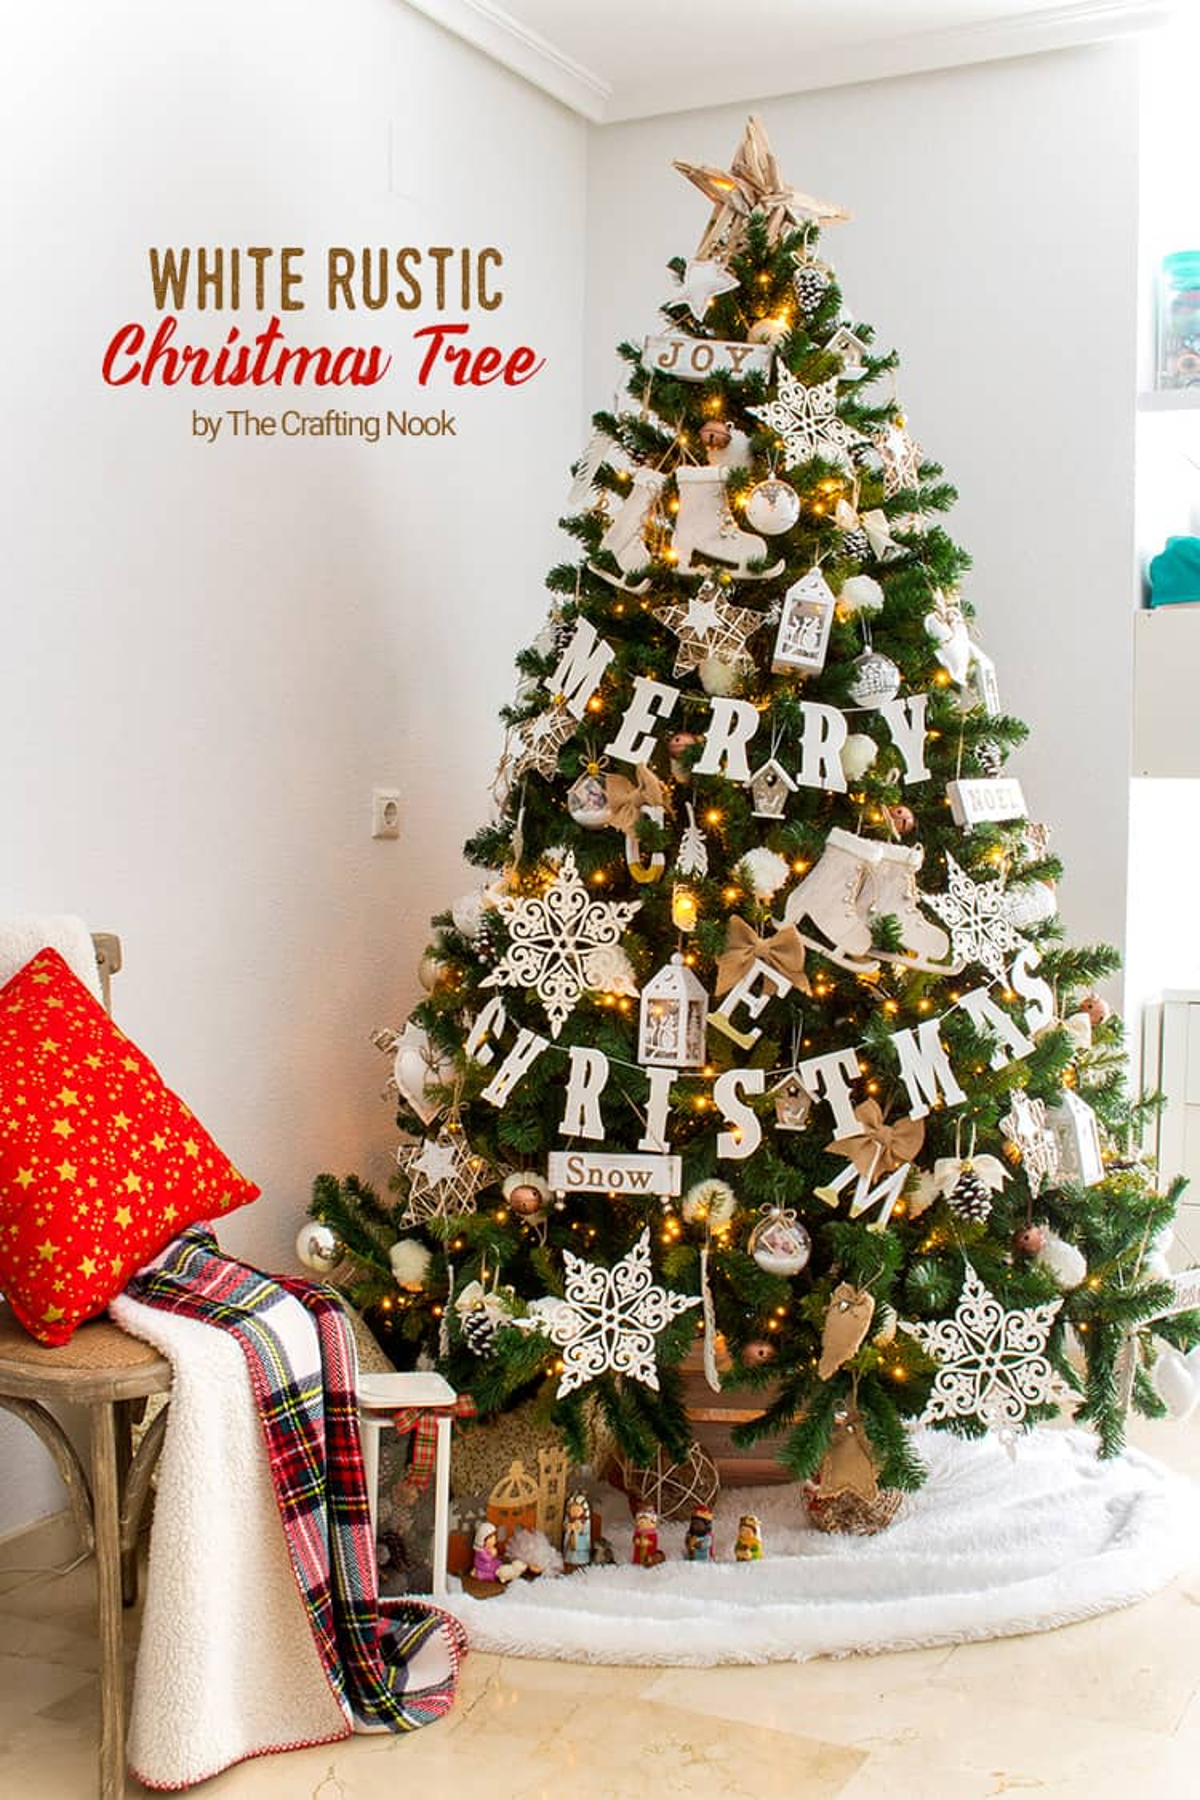 12 Ft White Christmas Tree